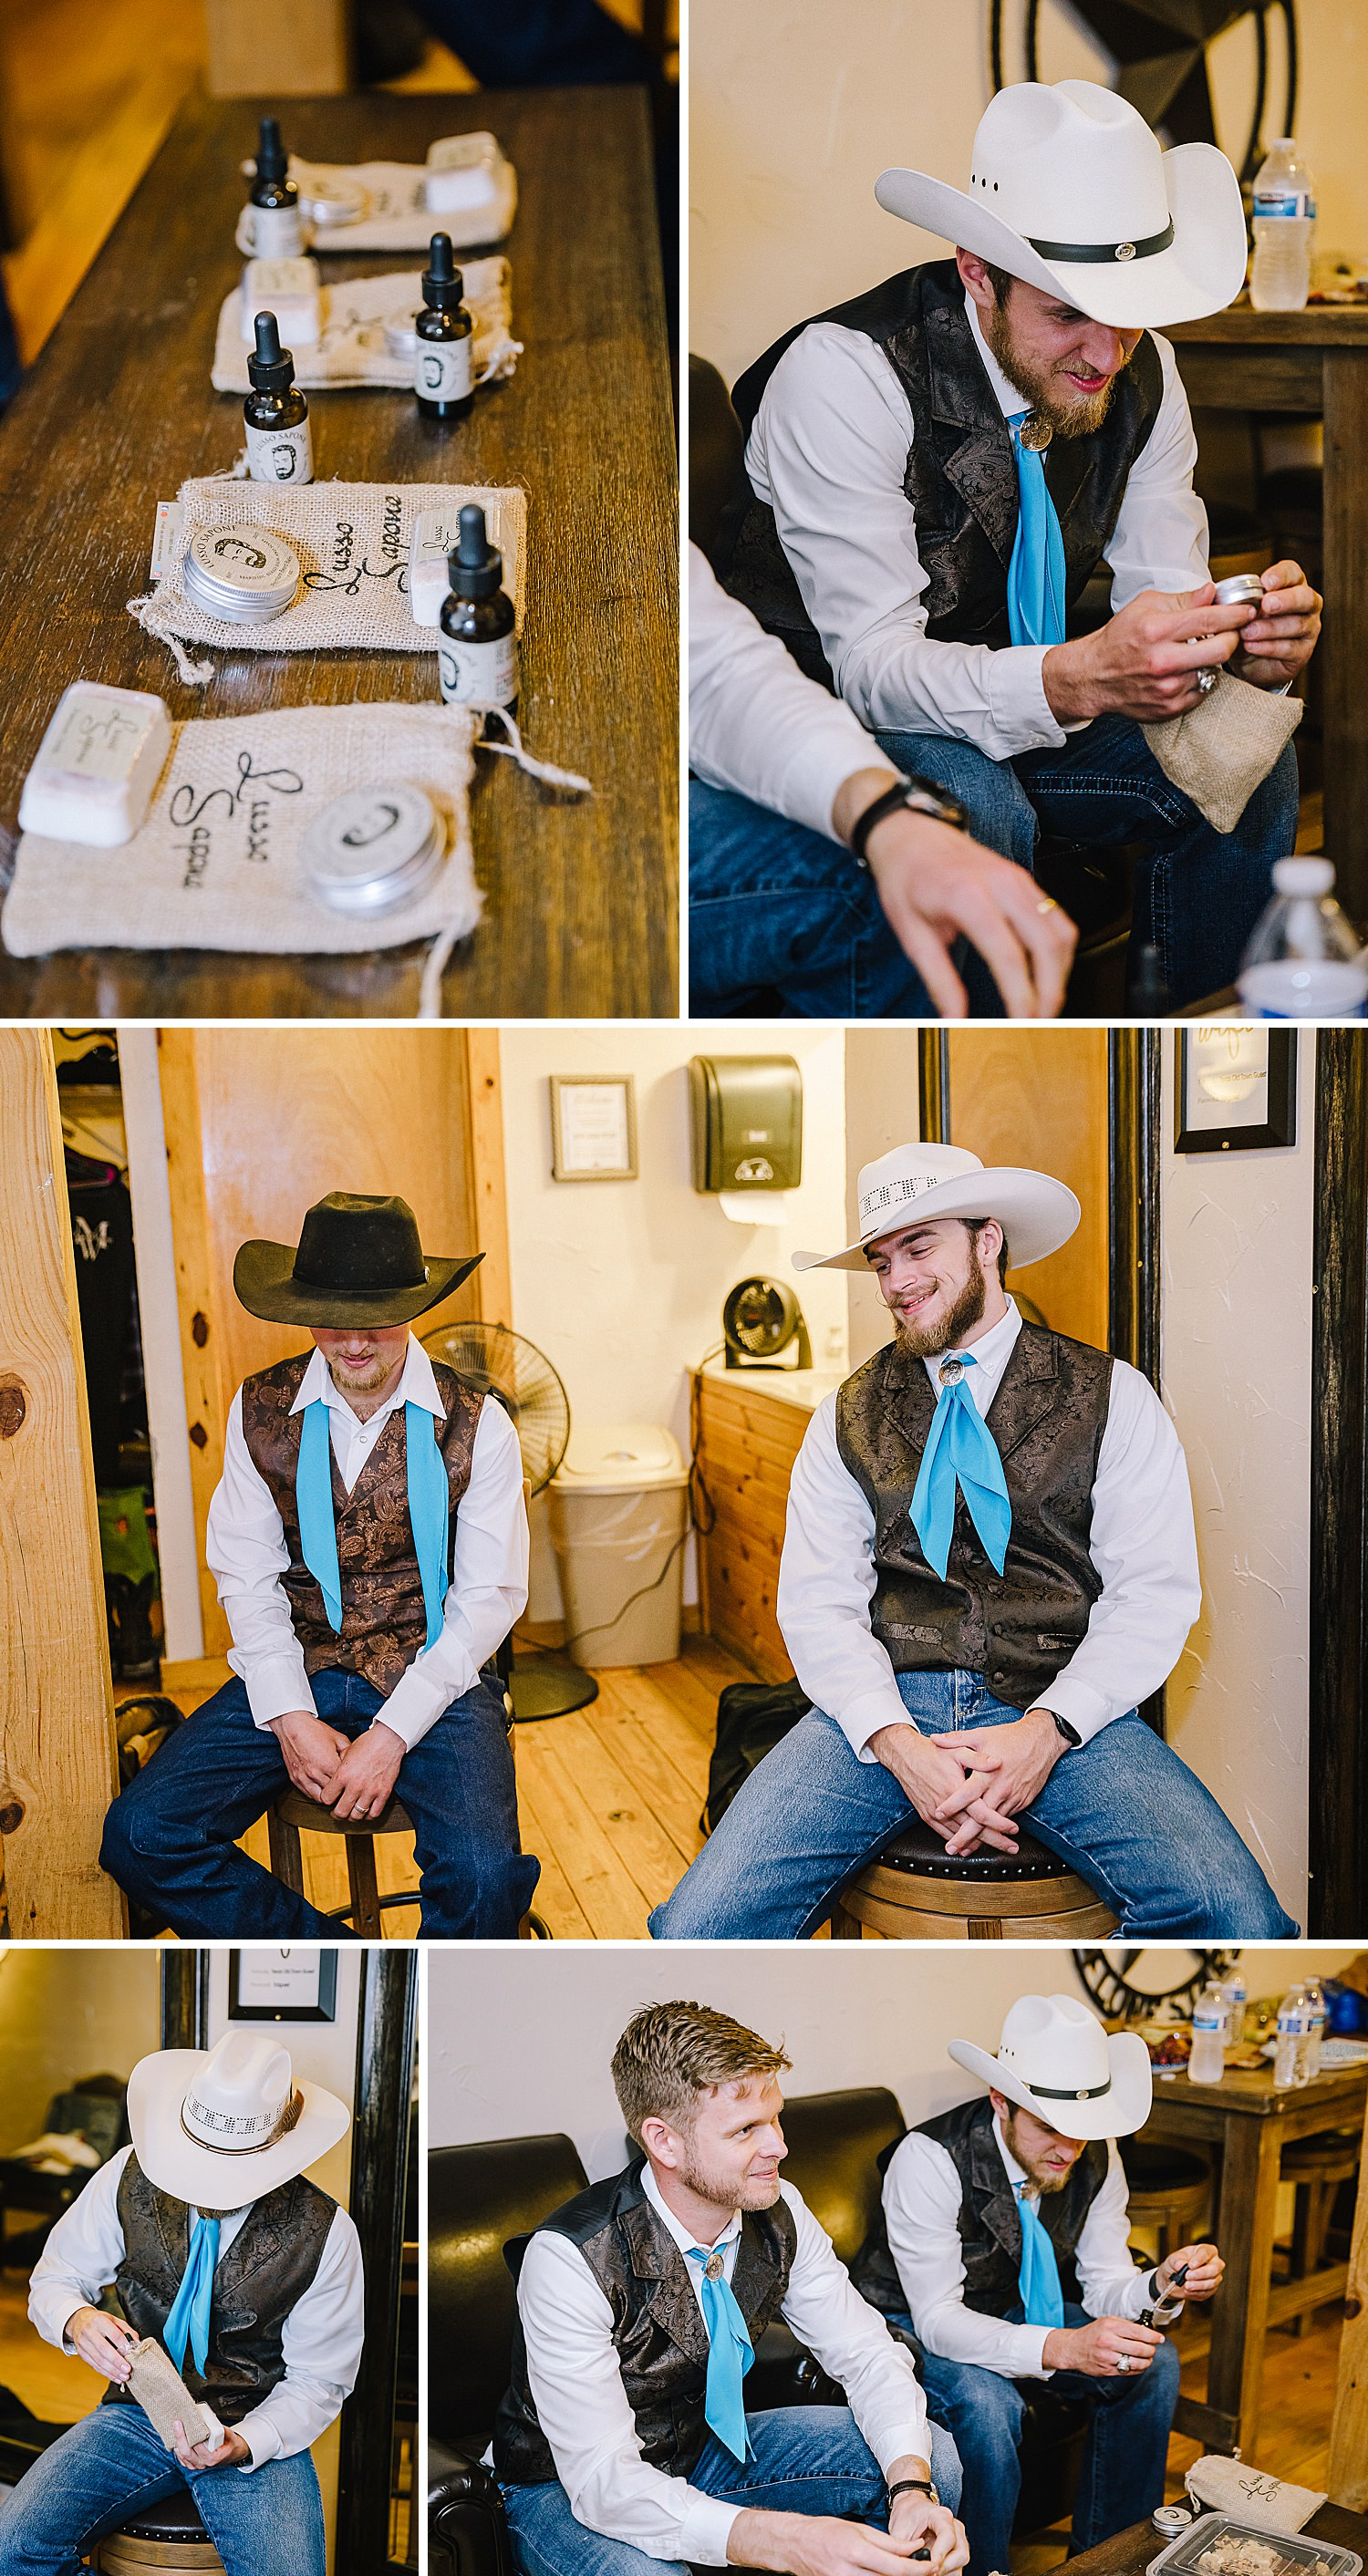 Carly-Barton-Photography-Old-Town-Texas-Rustic-Wedding-Photos-Sunflowers-Boots-Kyle-Texas_0013.jpg